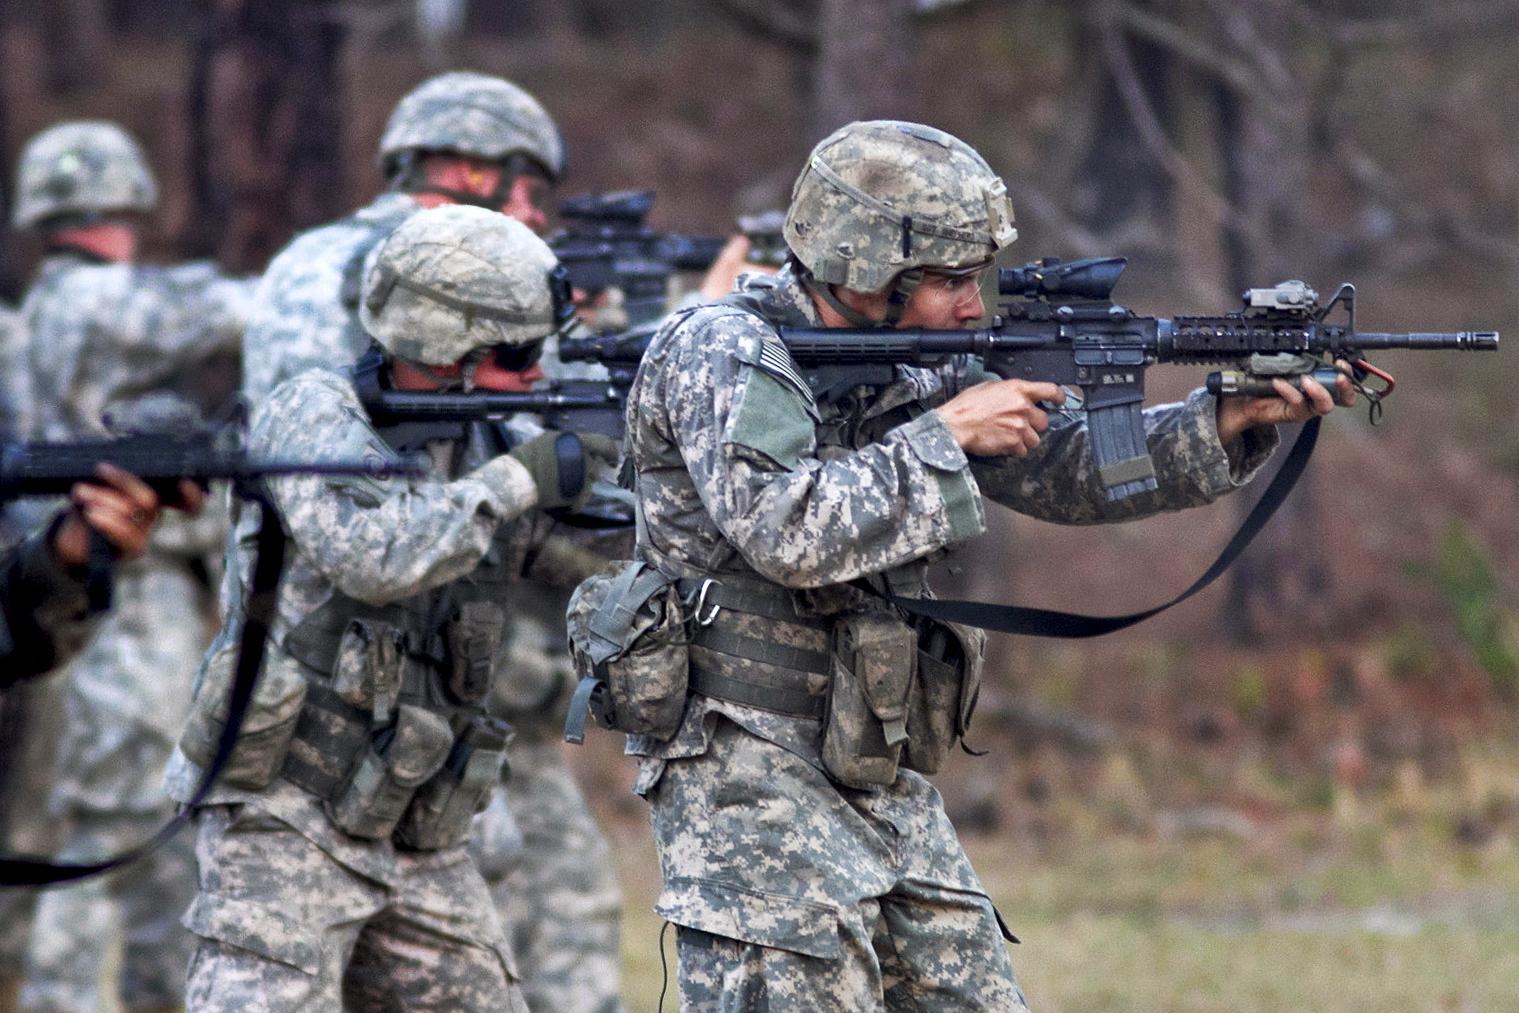 Flickr_-_The_U.S._Army_-_Marksmanship_training_(1)